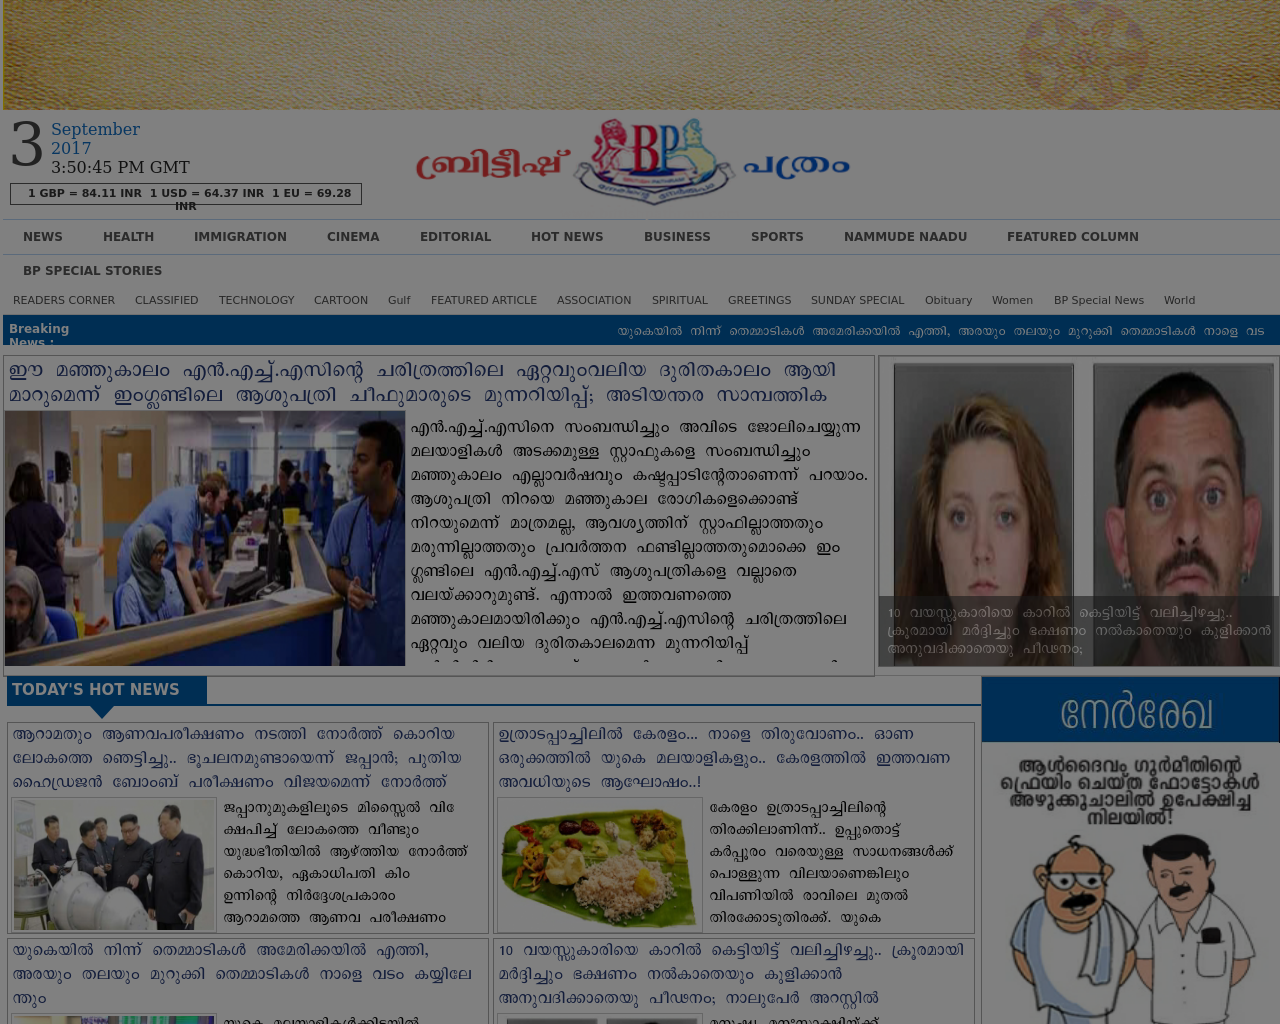 BRISKODA-(The-Skoda-Forum-and-Community)-Advertising-Reviews-Pricing